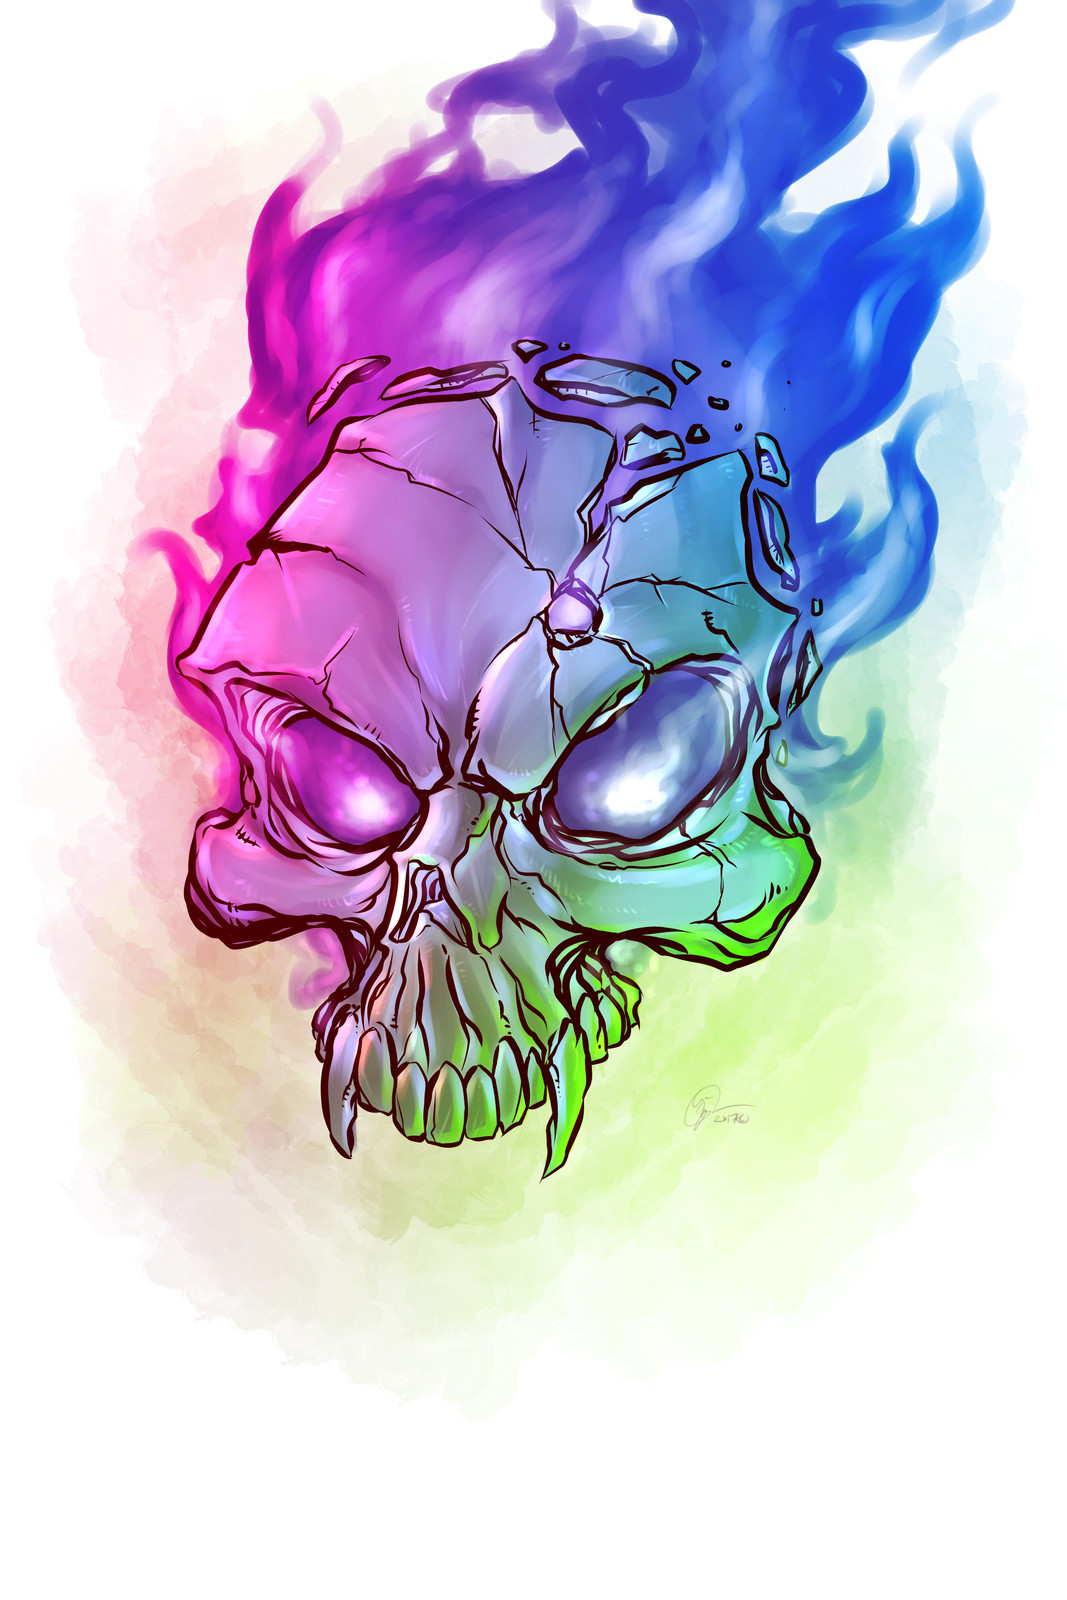 Kill Shot #Skull #SurfaceArt #CreatedOnSurface #Drawing #Sketch #Illustration #DailySketch #SketchBook #ConceptArt #CharacterDesign #Sketching #SurfaceBook2 #ClipStudio